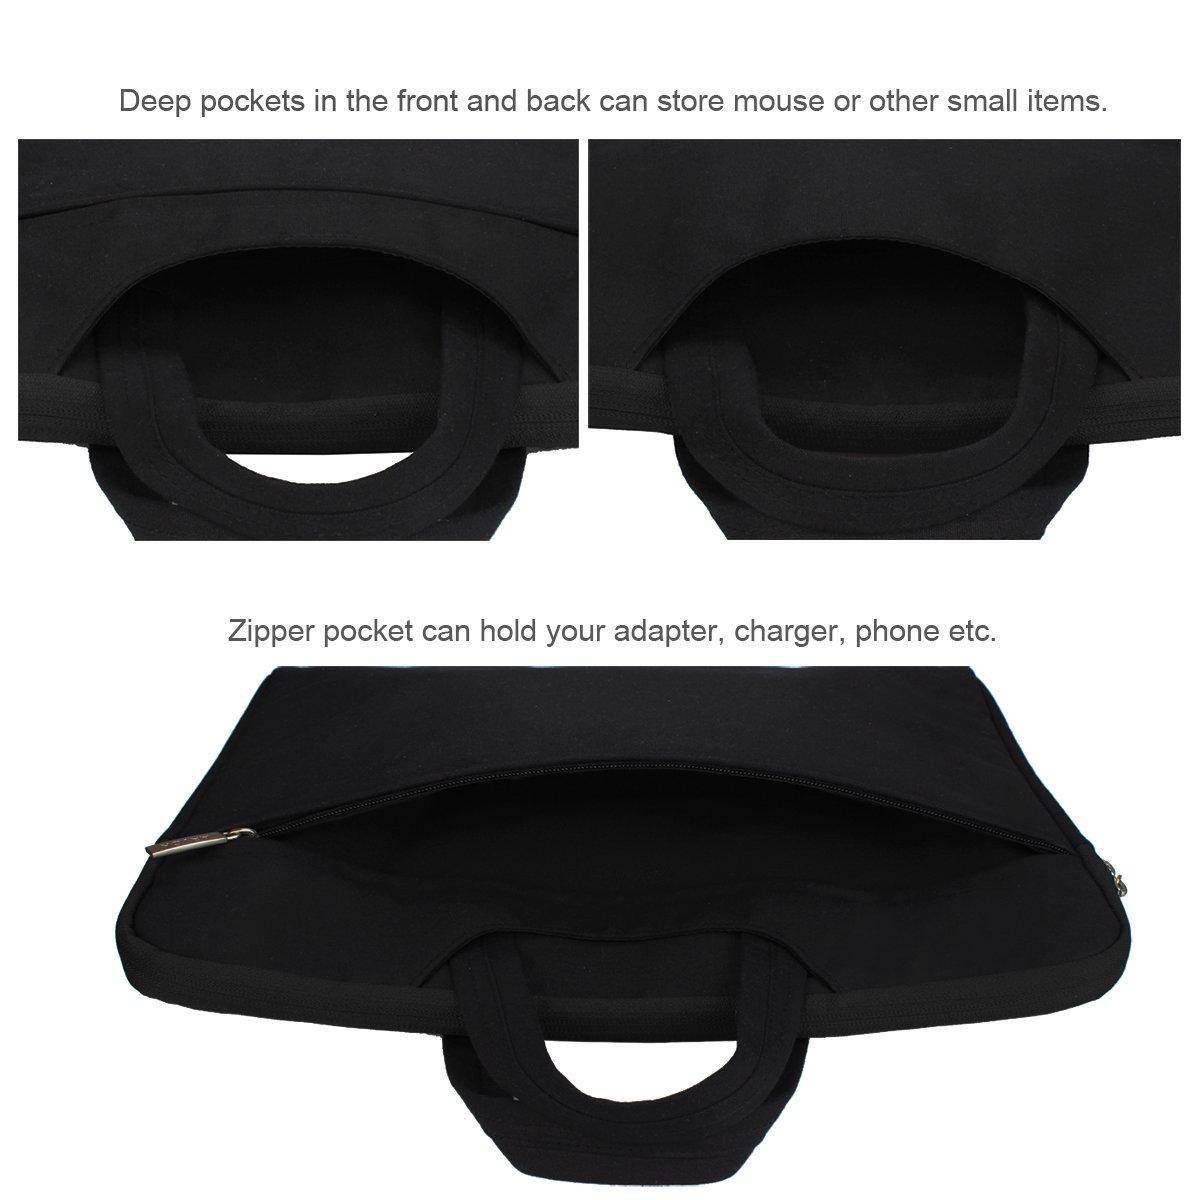 Arvok 15 15.6 Inch Multi-Color & Size Water-resistant Laptop Sleeve Bag with Handle/Notebook Computer Case/Ultrabook Briefcase Carrying Bag, Black by ARVOK (Image #7)